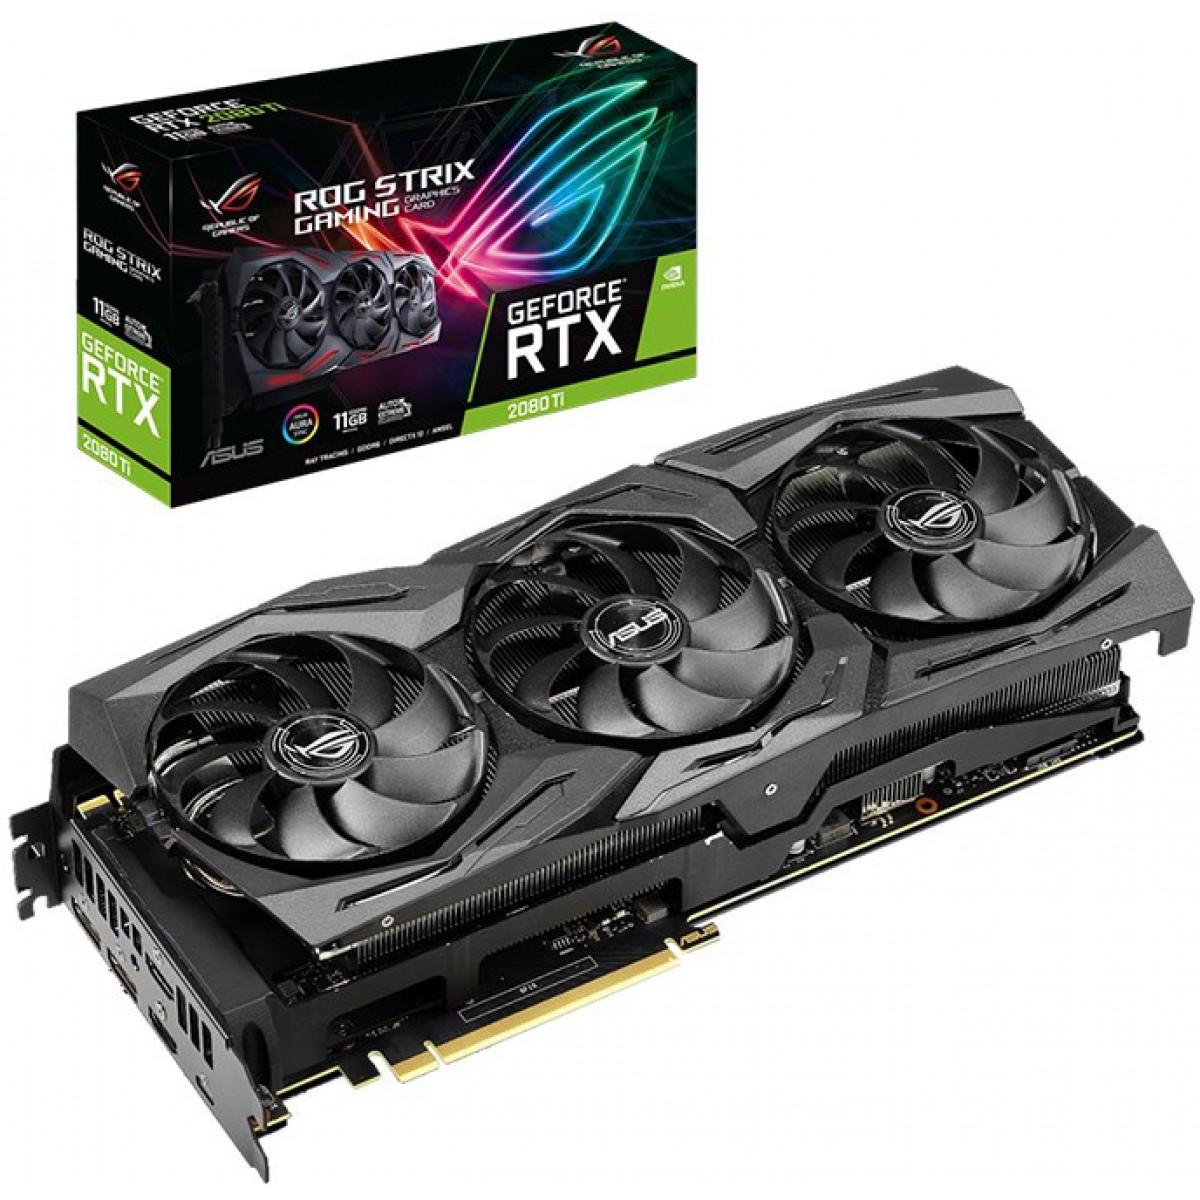 Placa de Vídeo Asus Geforce RTX 2080 Ti Rog Strix Gaming, 11GB GDDR6, 352Bit, ROG-STRIX-RTX2080TI-11G-GAMING